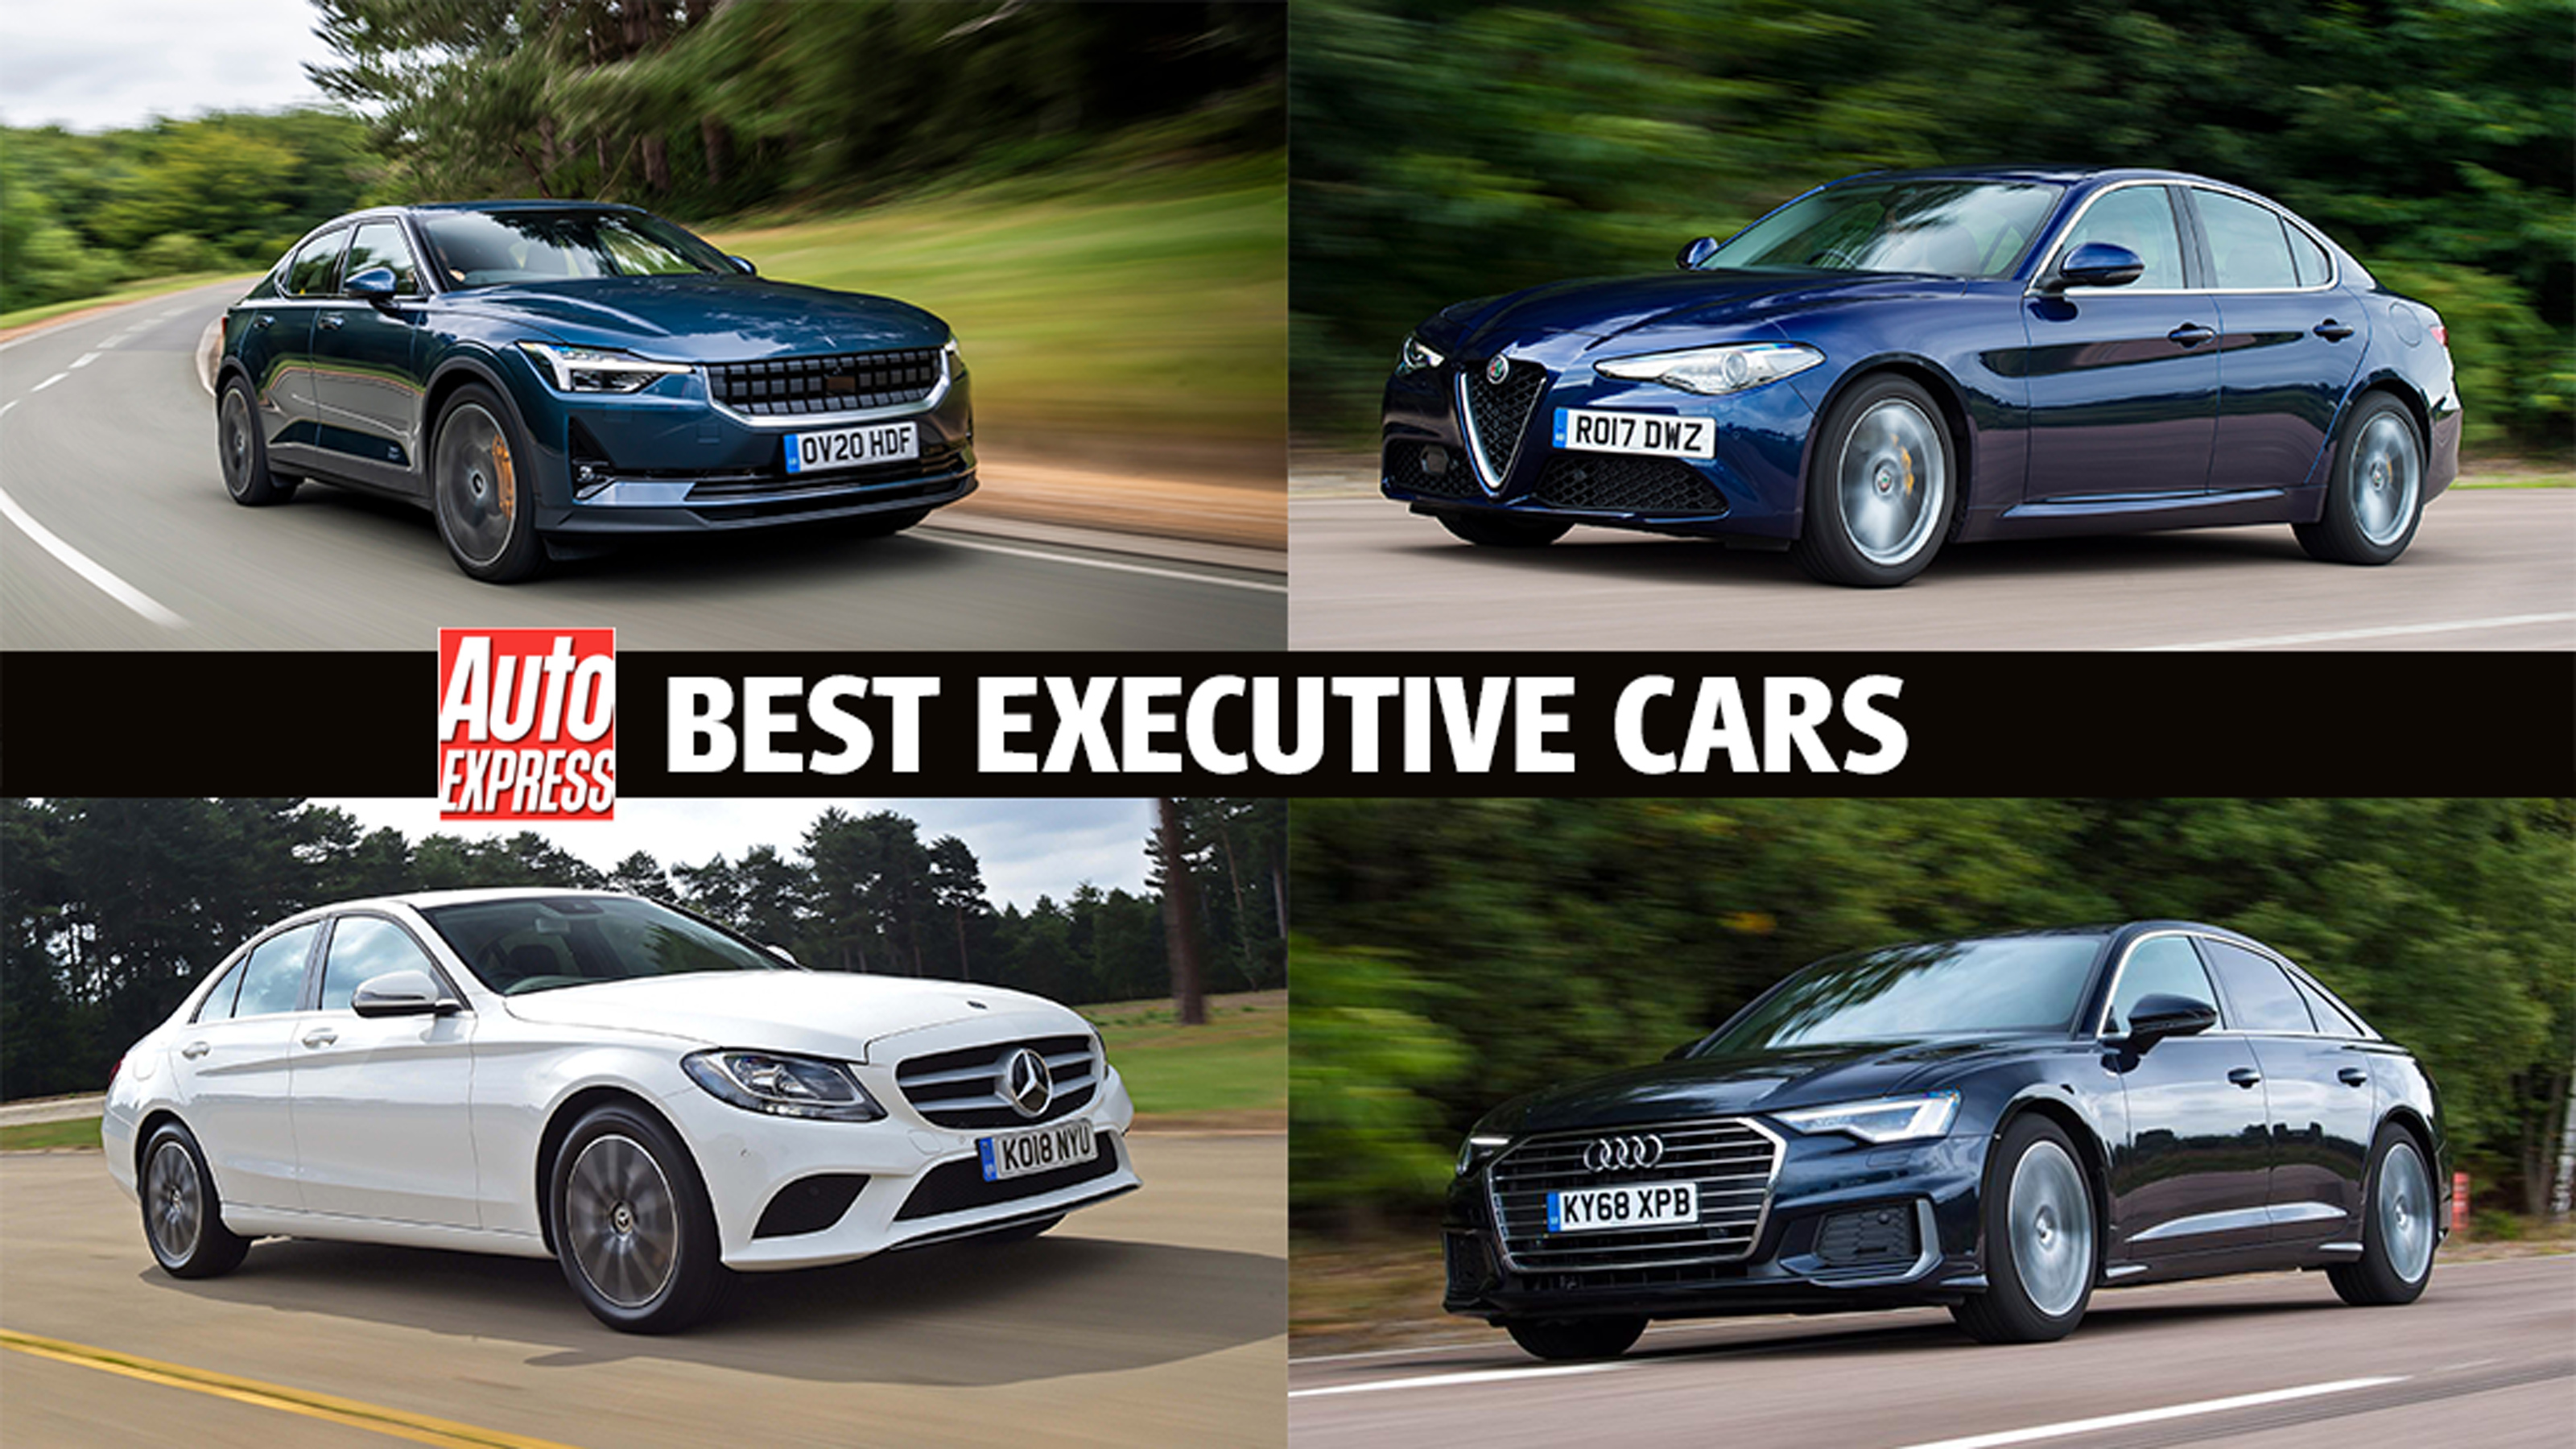 Best Executive Cars 2021 Auto Express